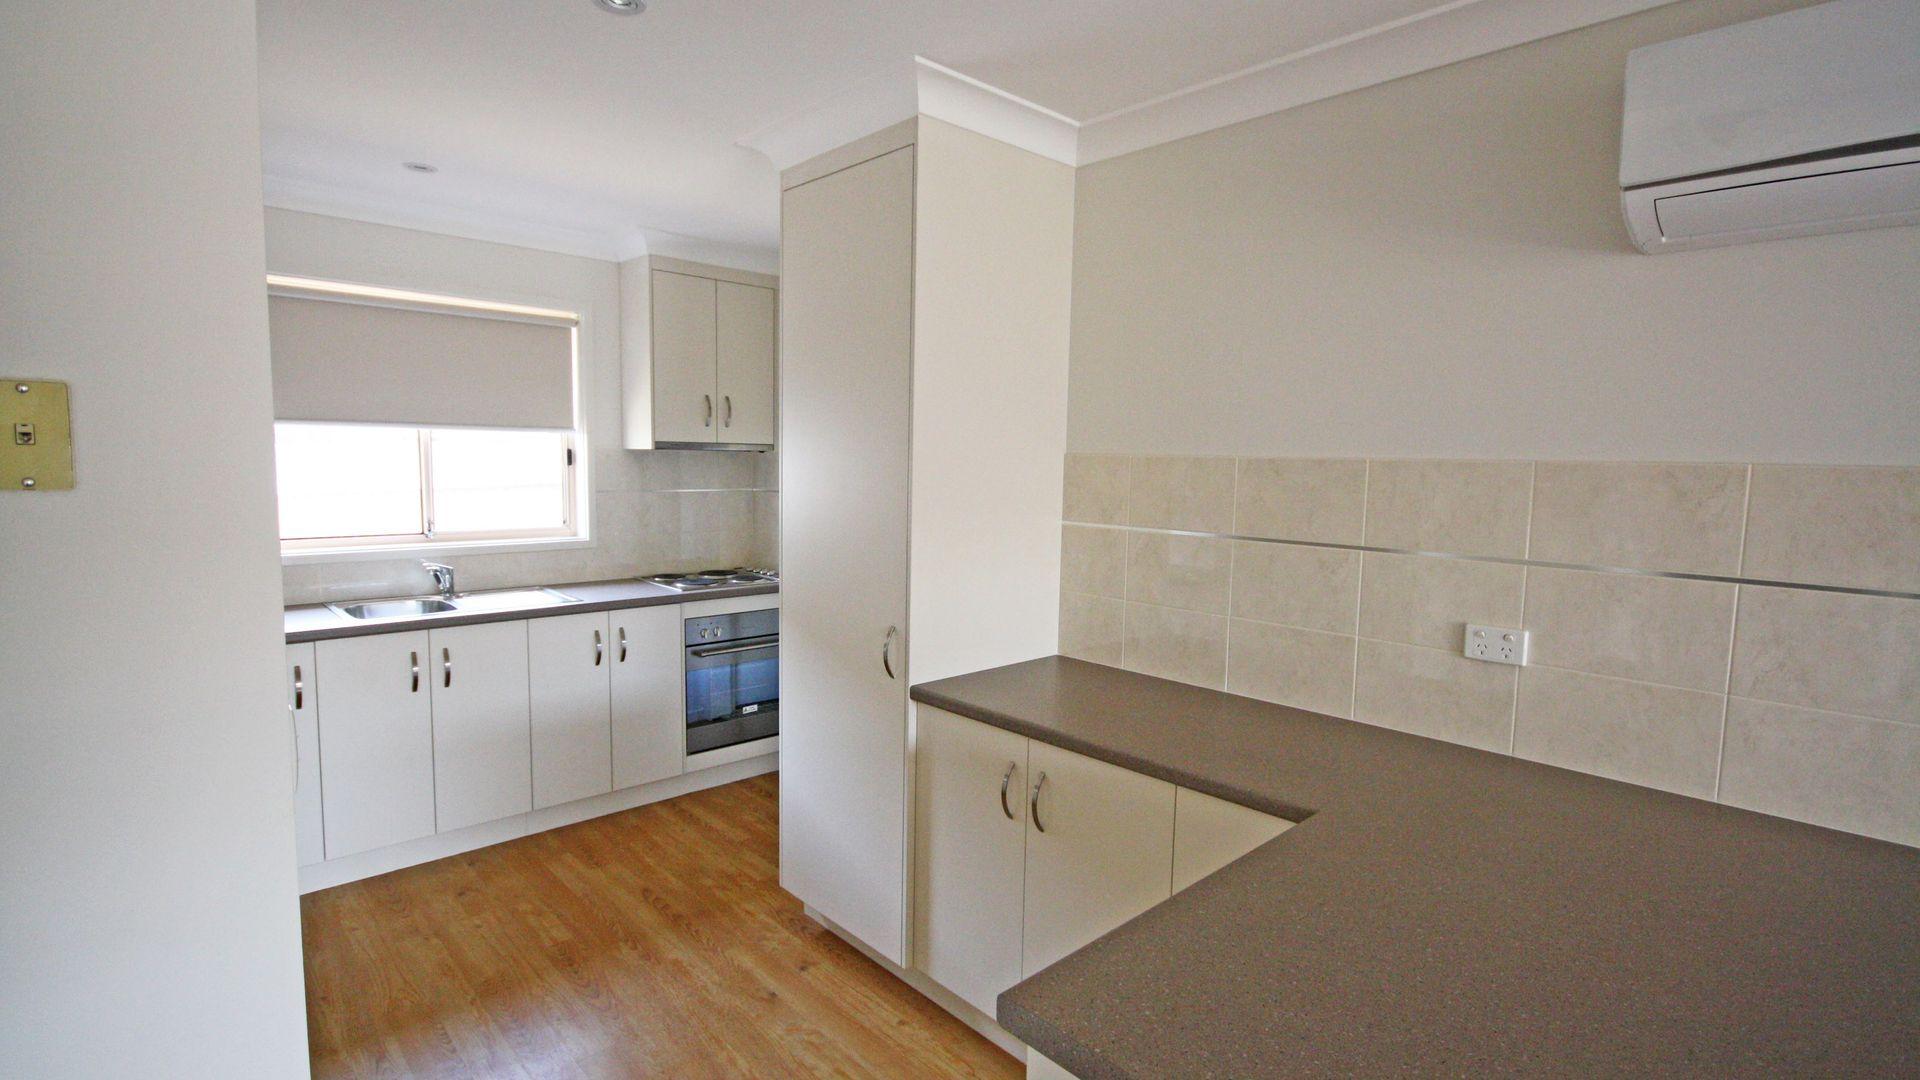 2/30 Kenneally Street, Kooringal NSW 2650, Image 1